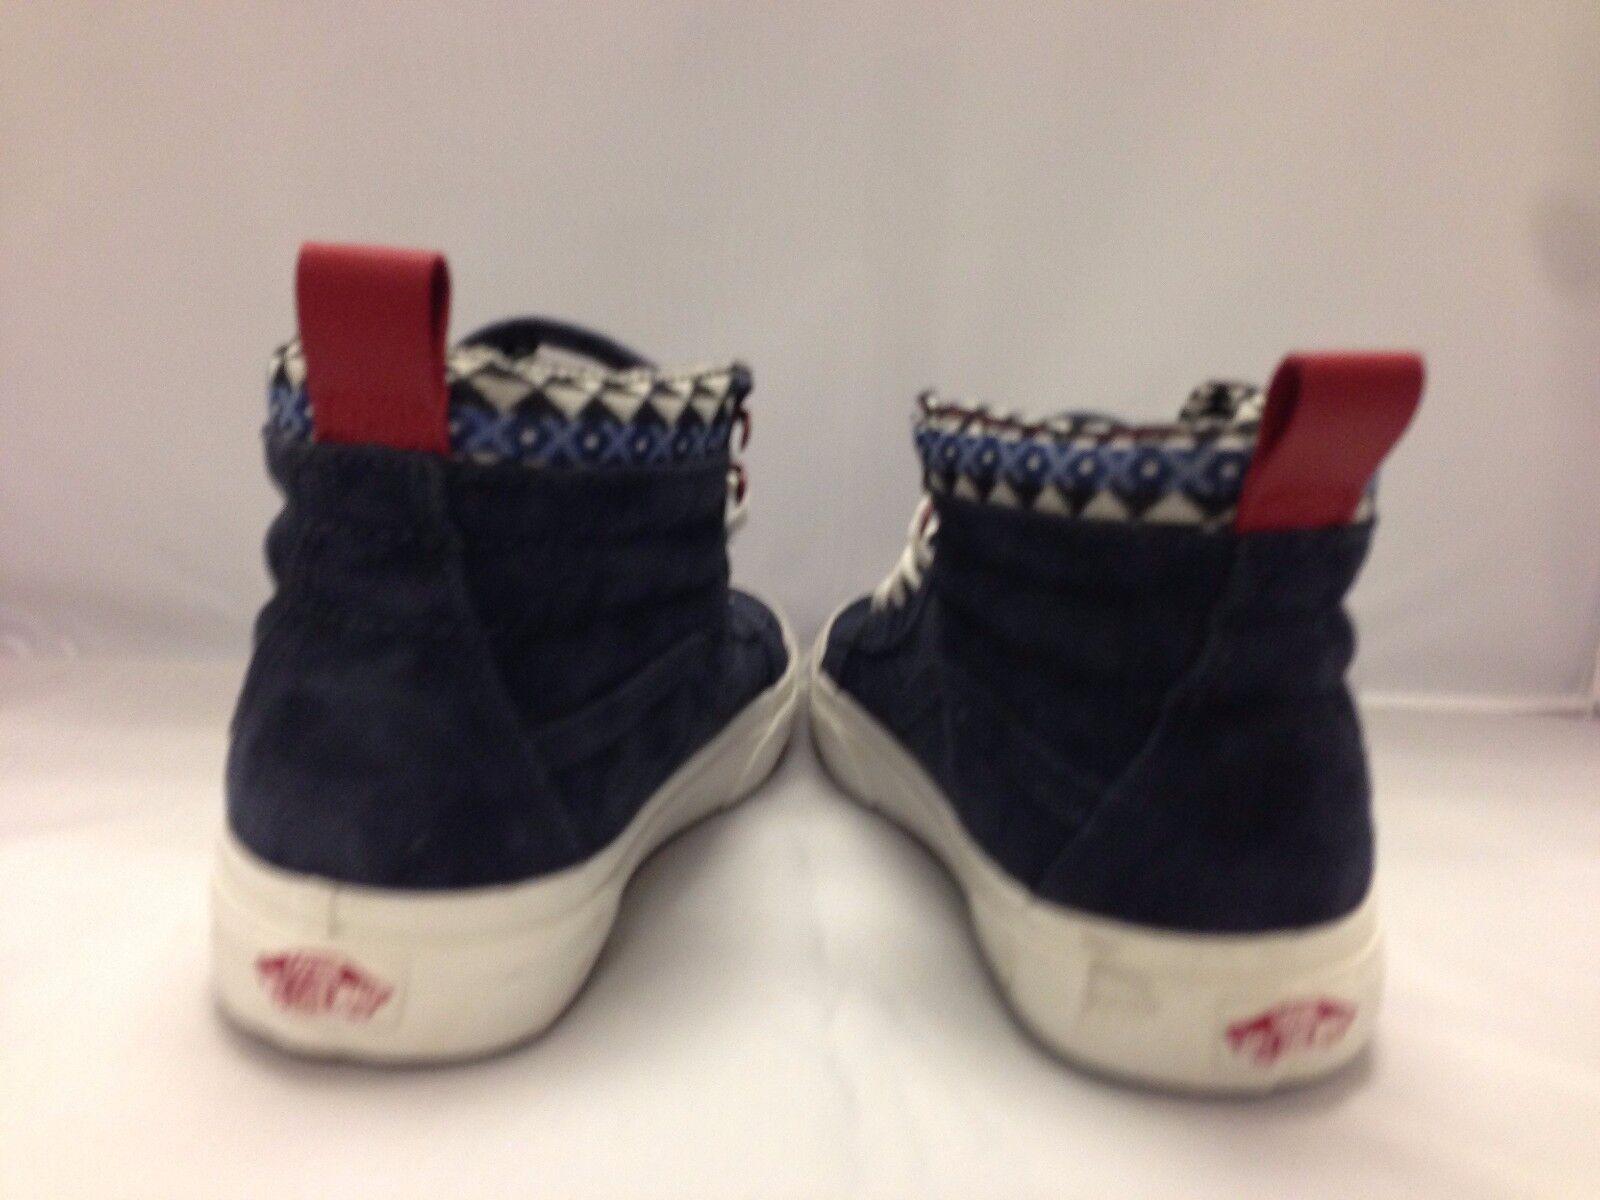 Vans Herren Schuhe Sk8-Hi (MTE) Pariser Pariser Pariser NGT   Blcdblc ffa279